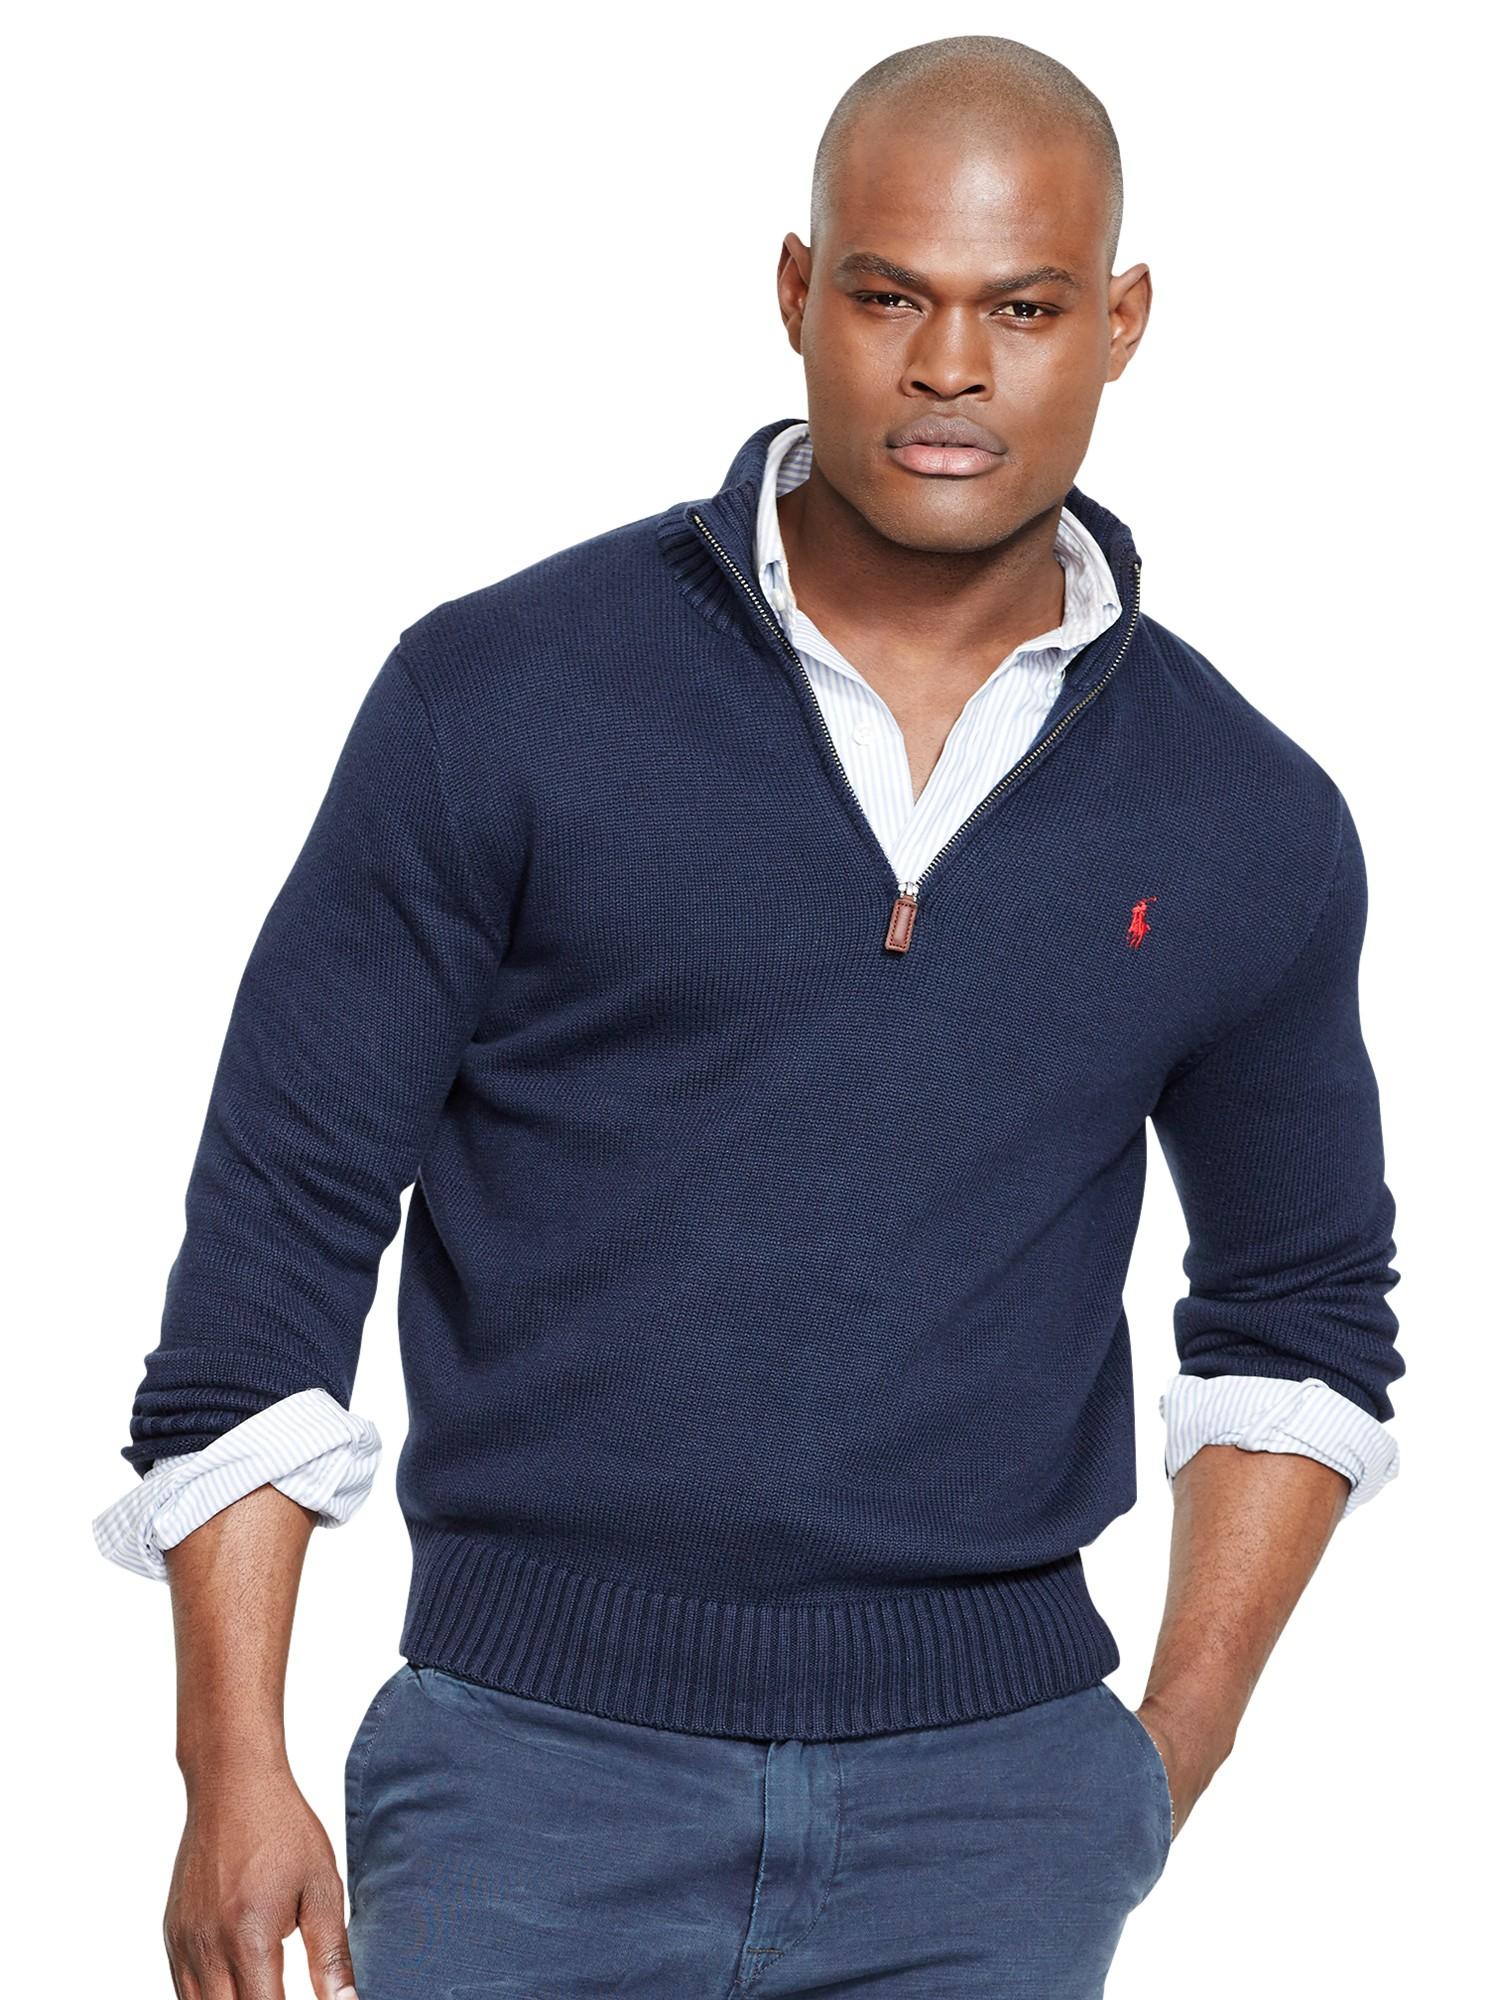 Ralph Lauren Fashion Show At New York: Polo Ralph Lauren Half Zip Cotton Jumper In Blue For Men